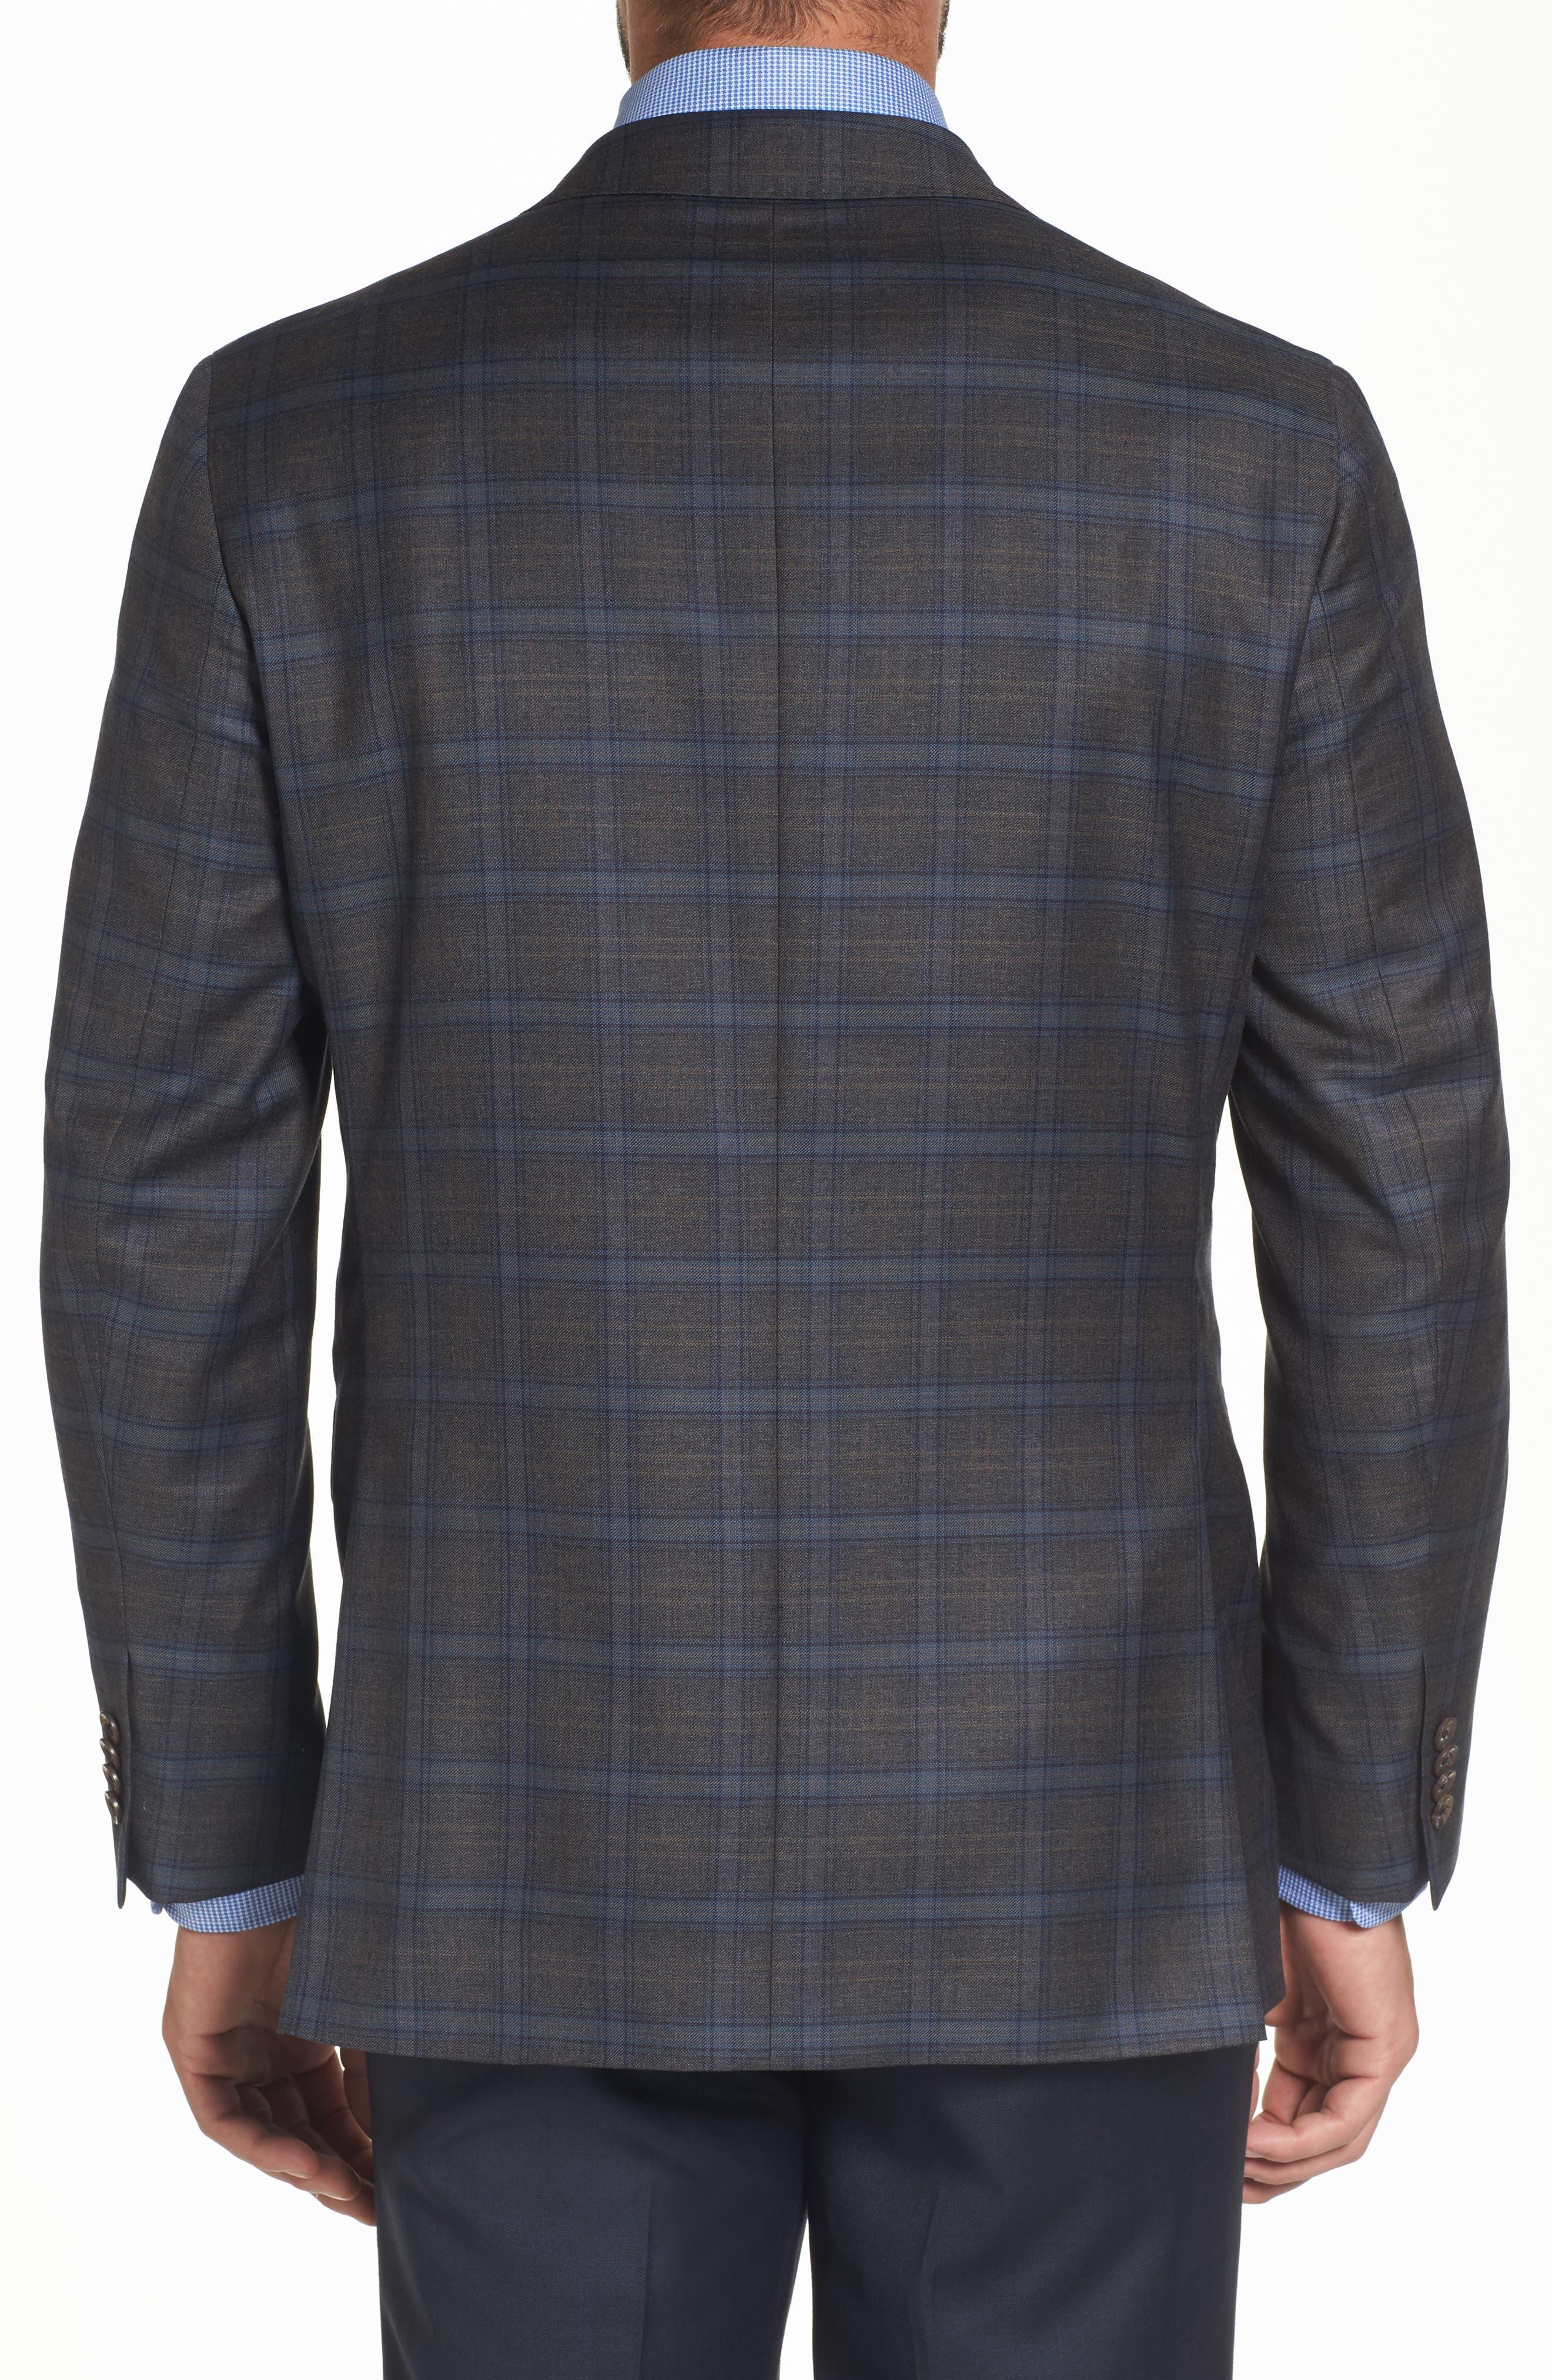 Arnold Classic Fit Plaid Wool Sport Coat,                             Alternate thumbnail 2, color,                             Grey